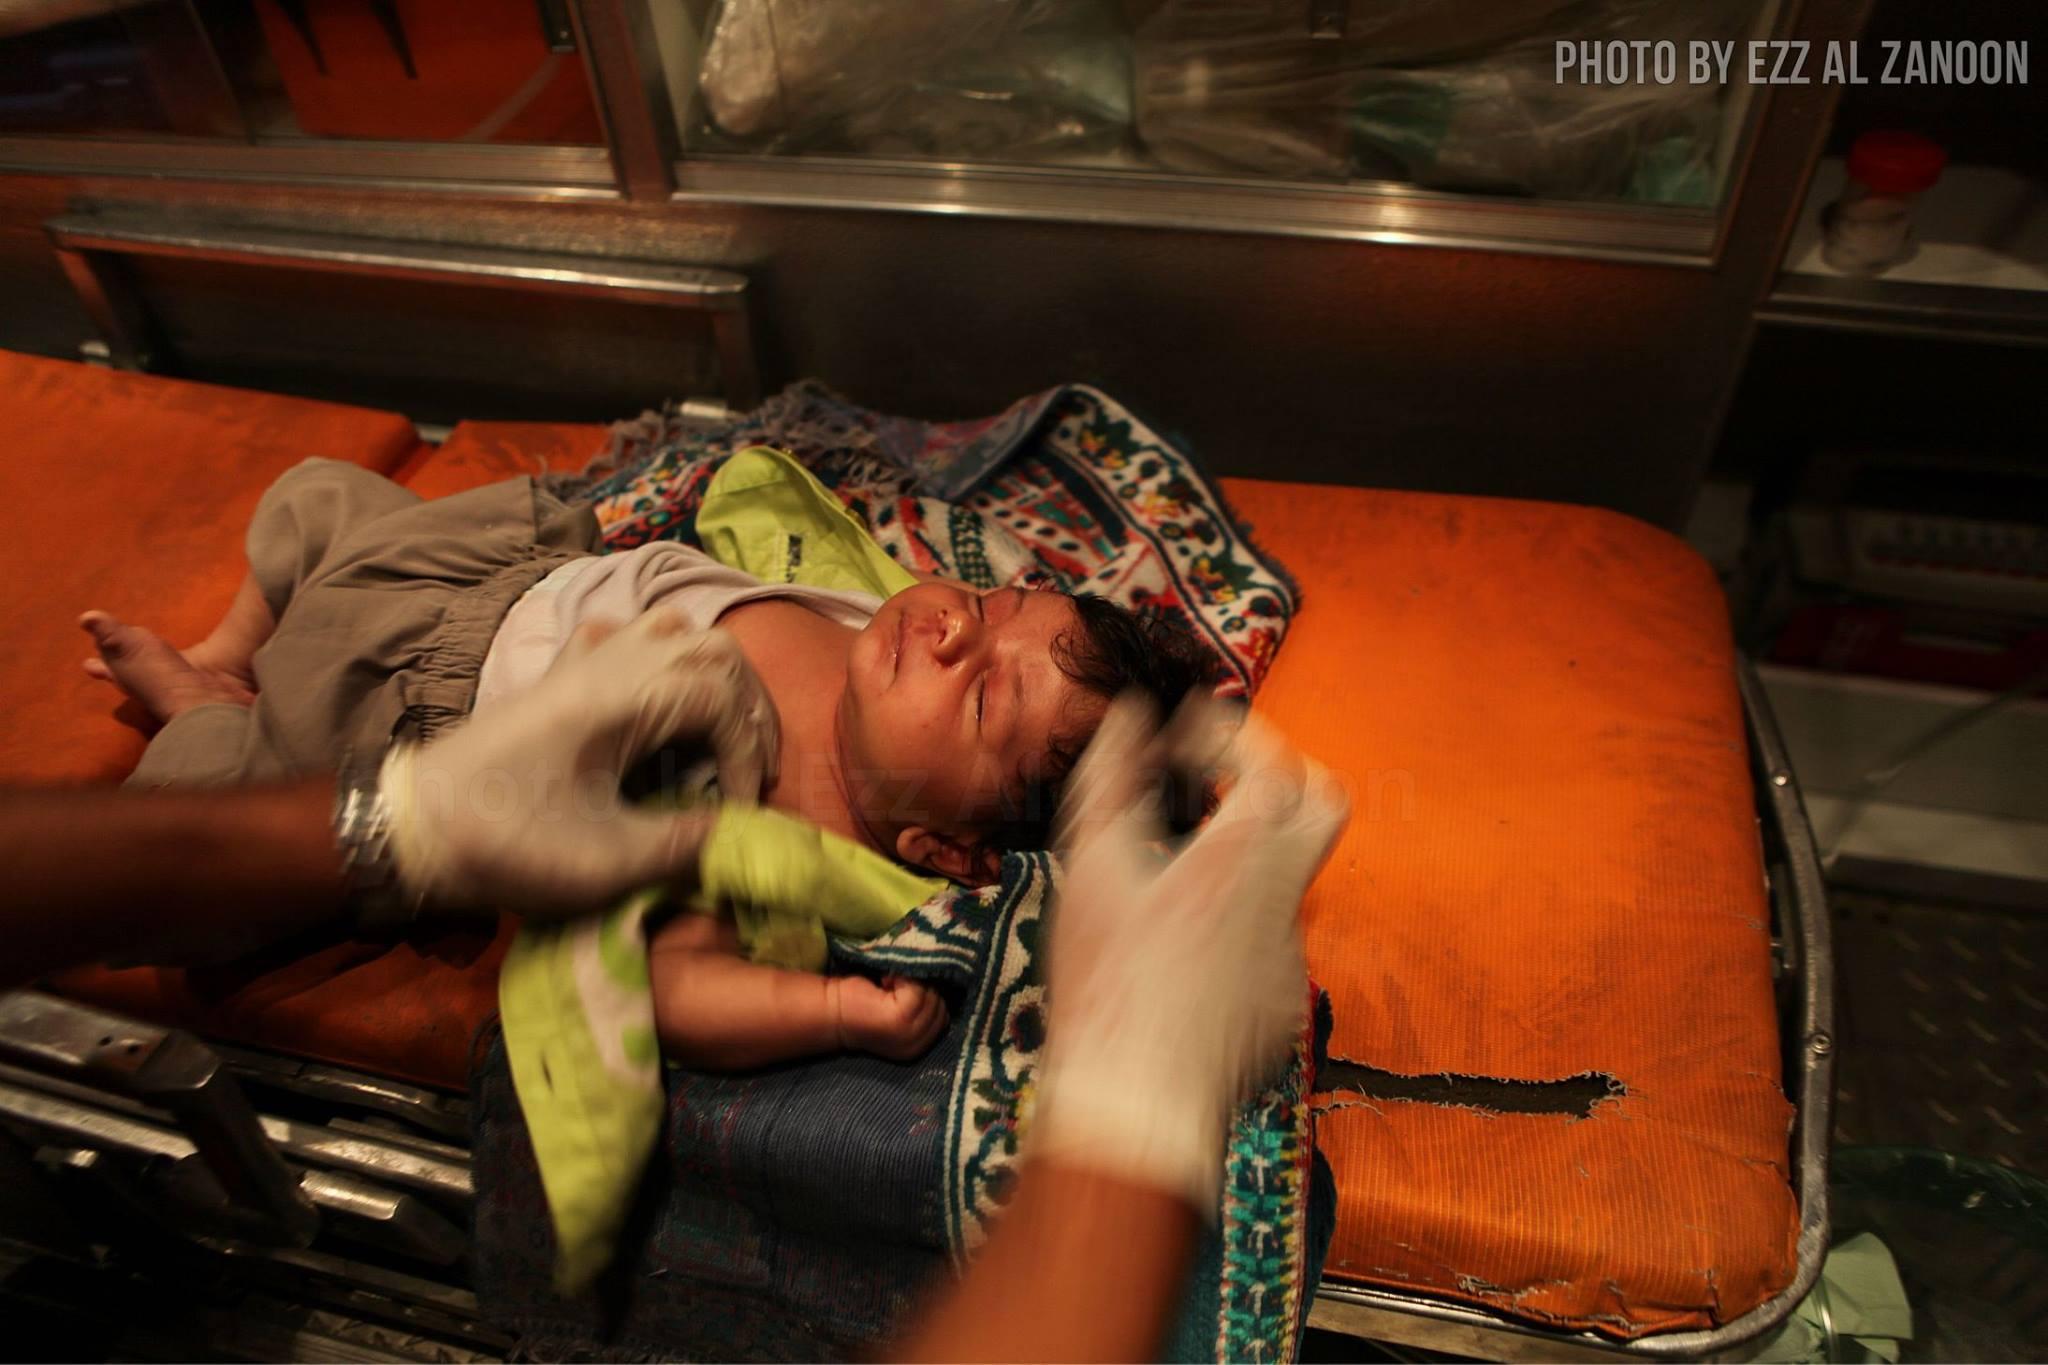 İsrail Yine Çocukları Vurdu-FOTO